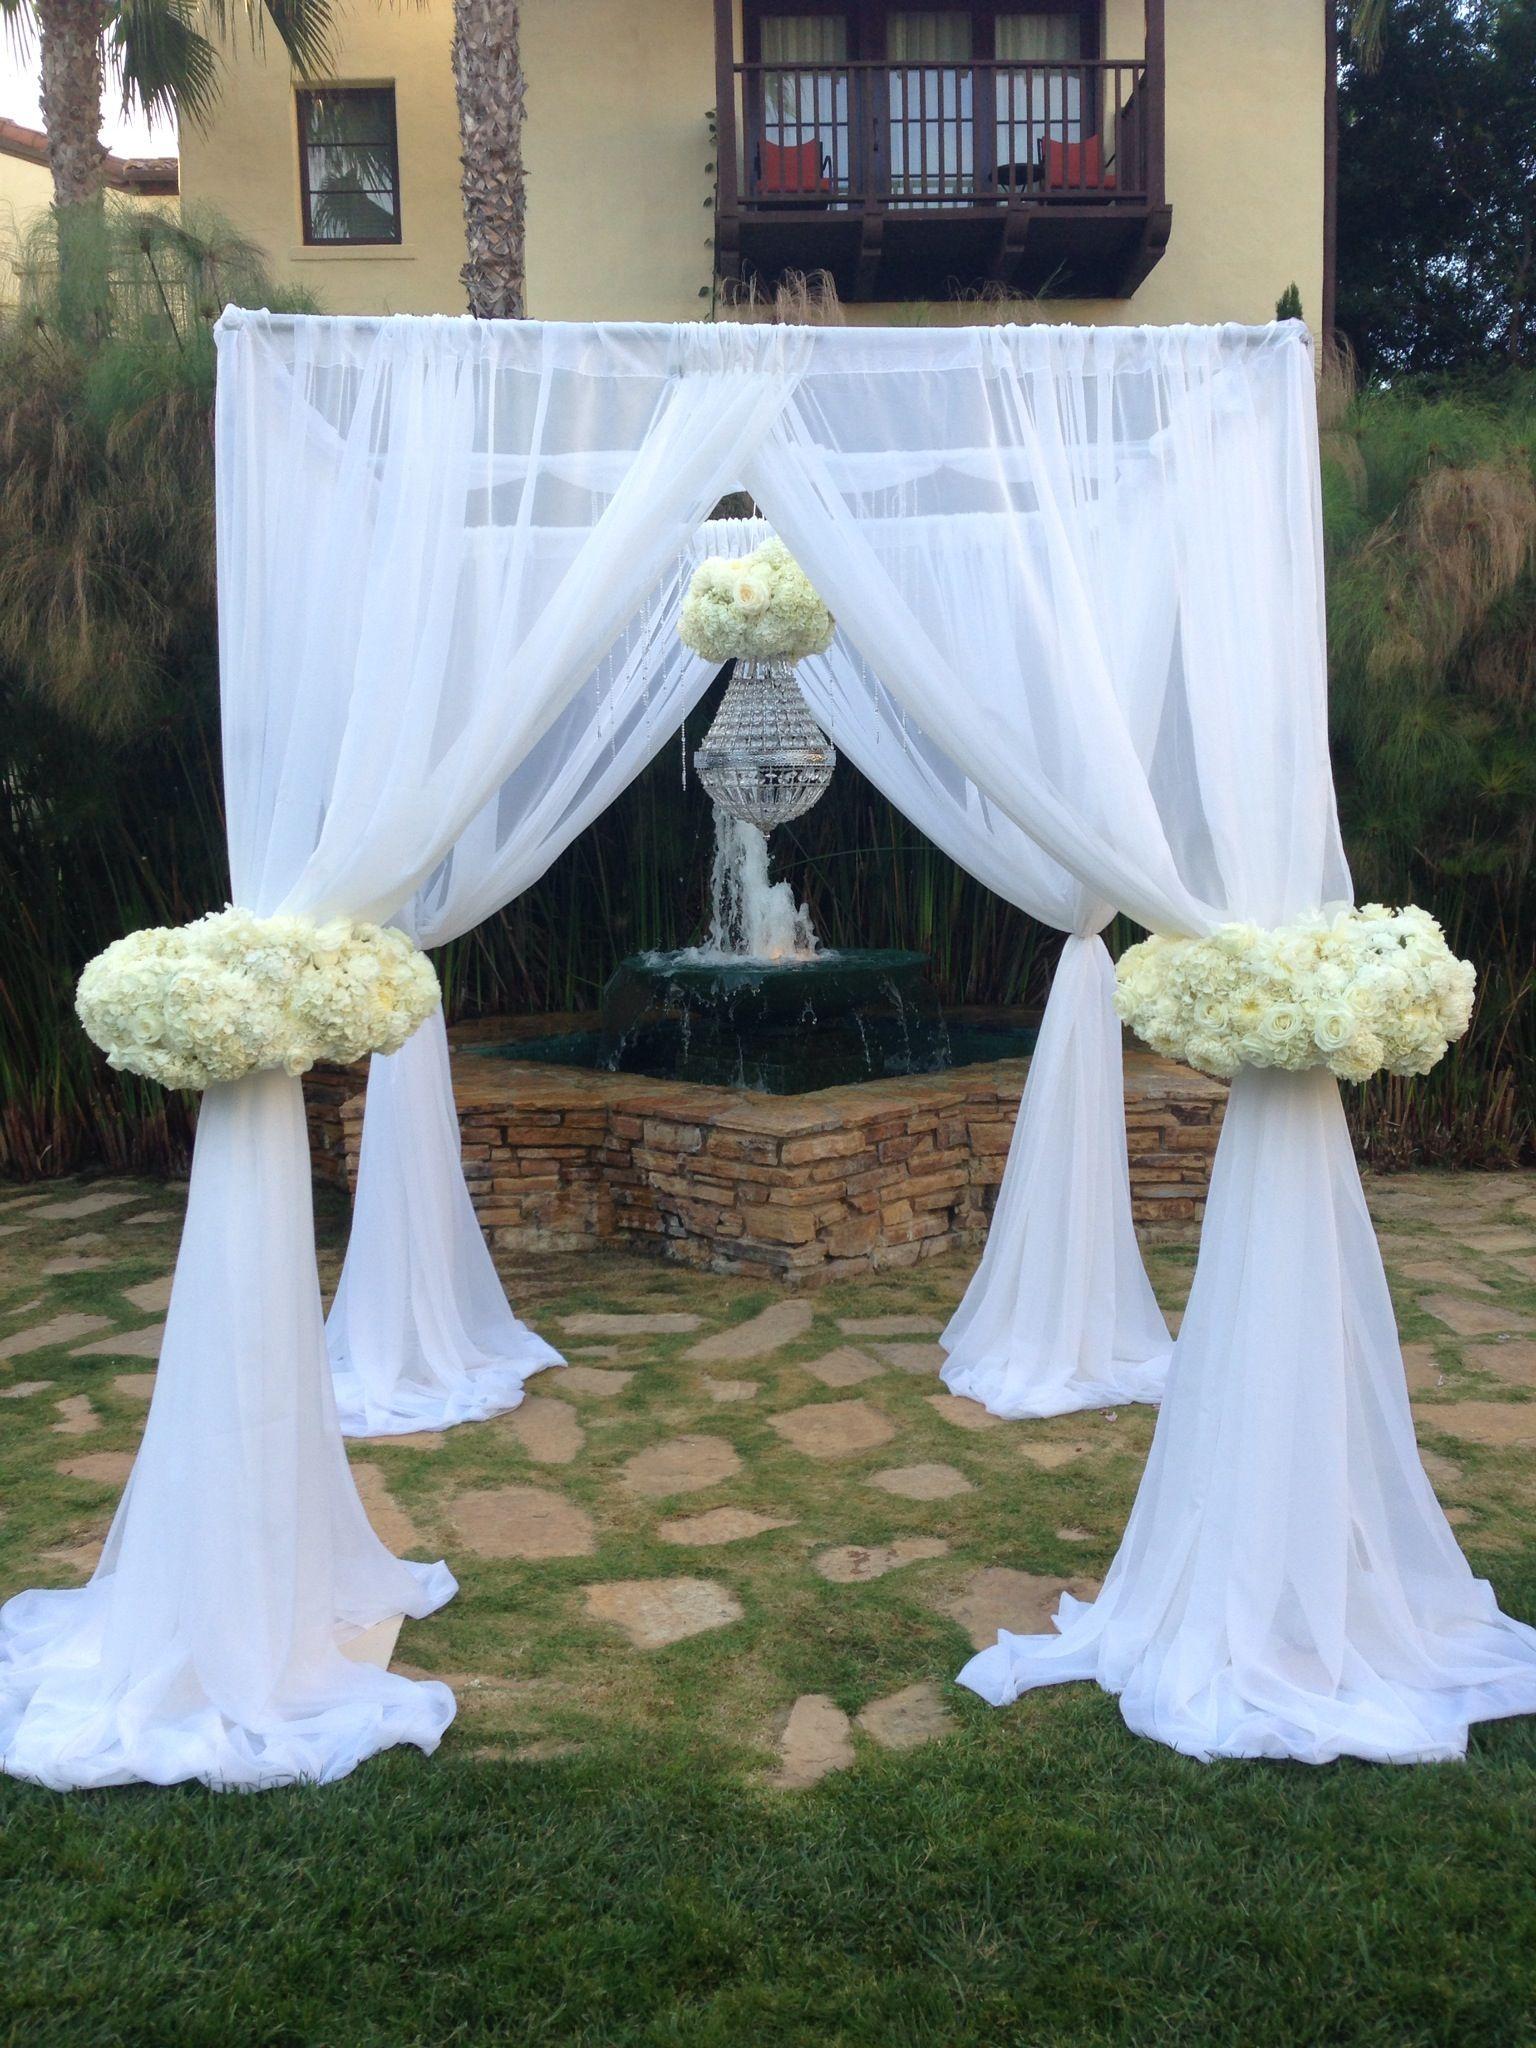 custom arch designed and built by flower box wedding arch white fabric hydrangeas